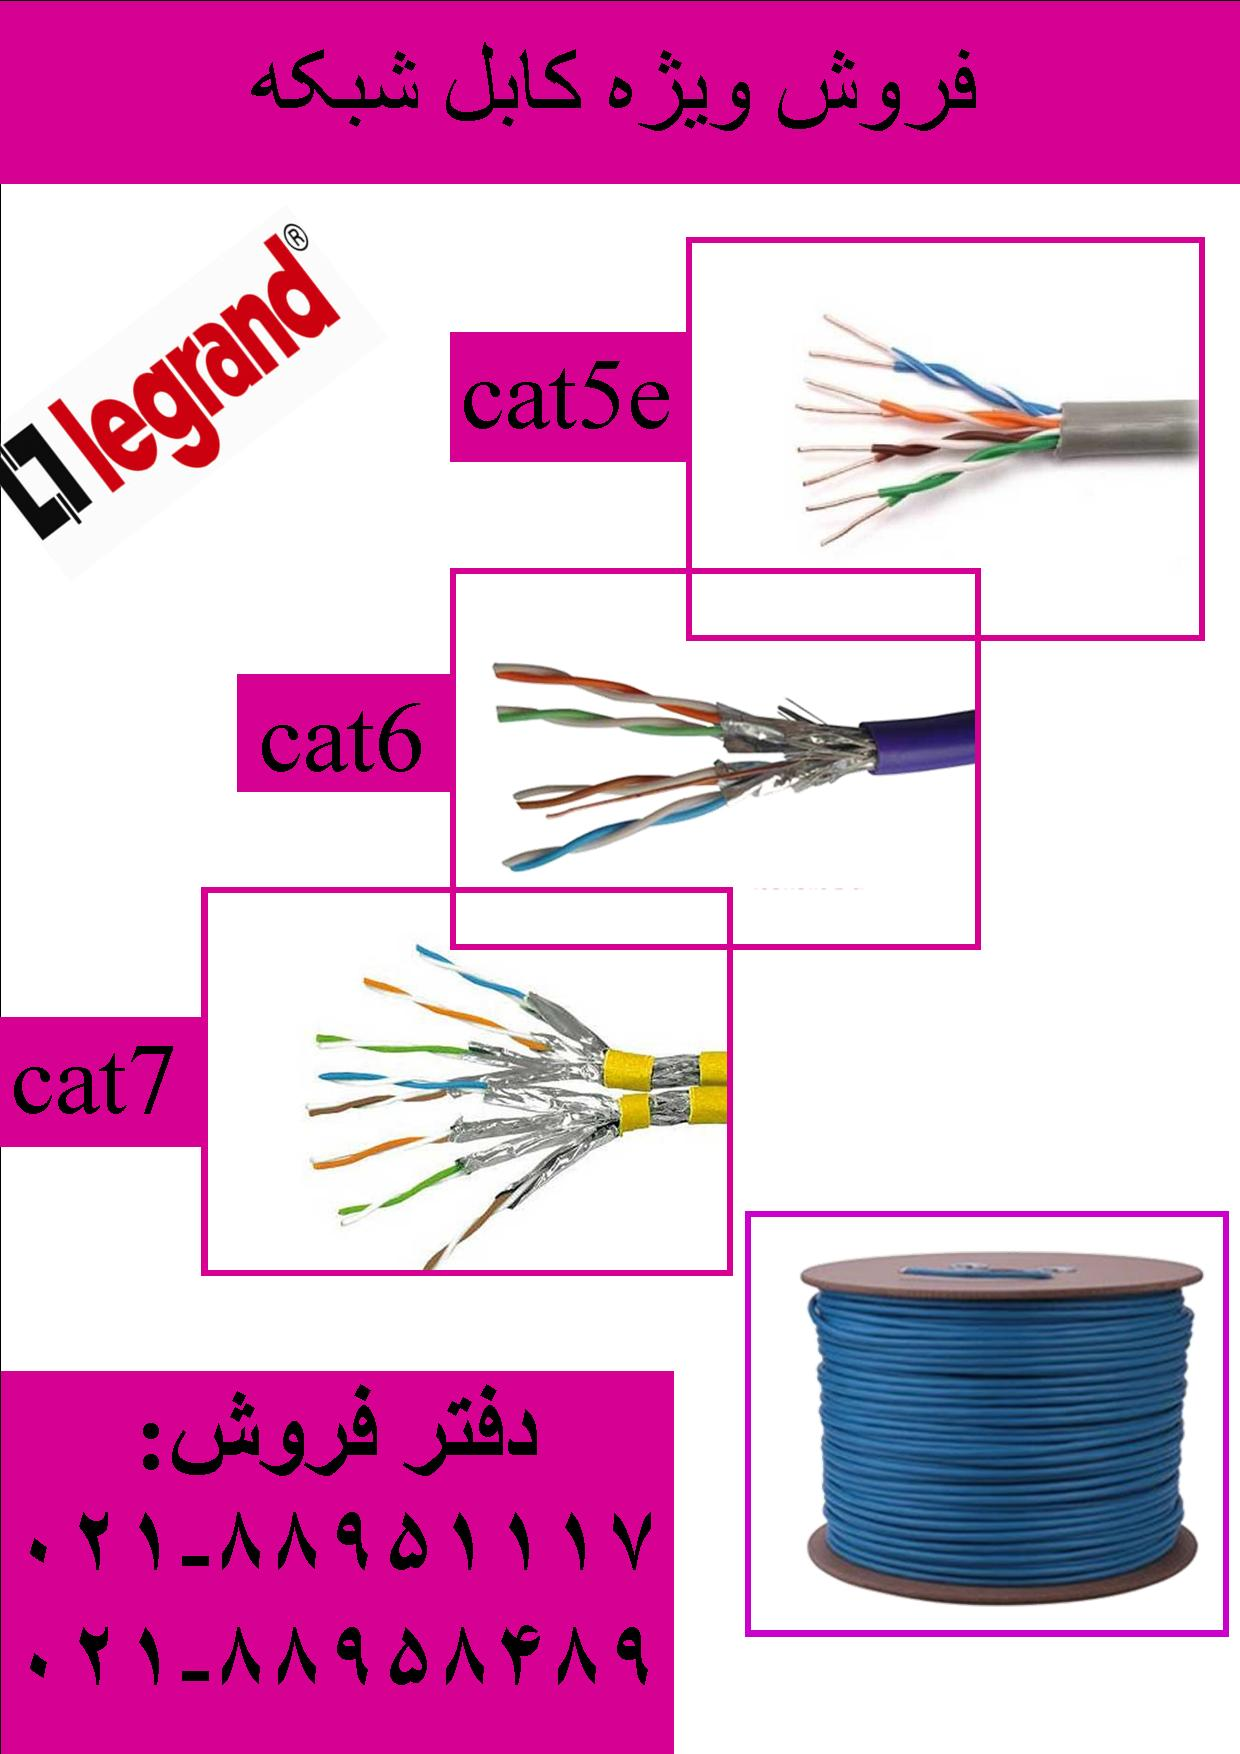 کابل لگراند فروش کابل لگراند LEGRAND تلفن تهران 88958489